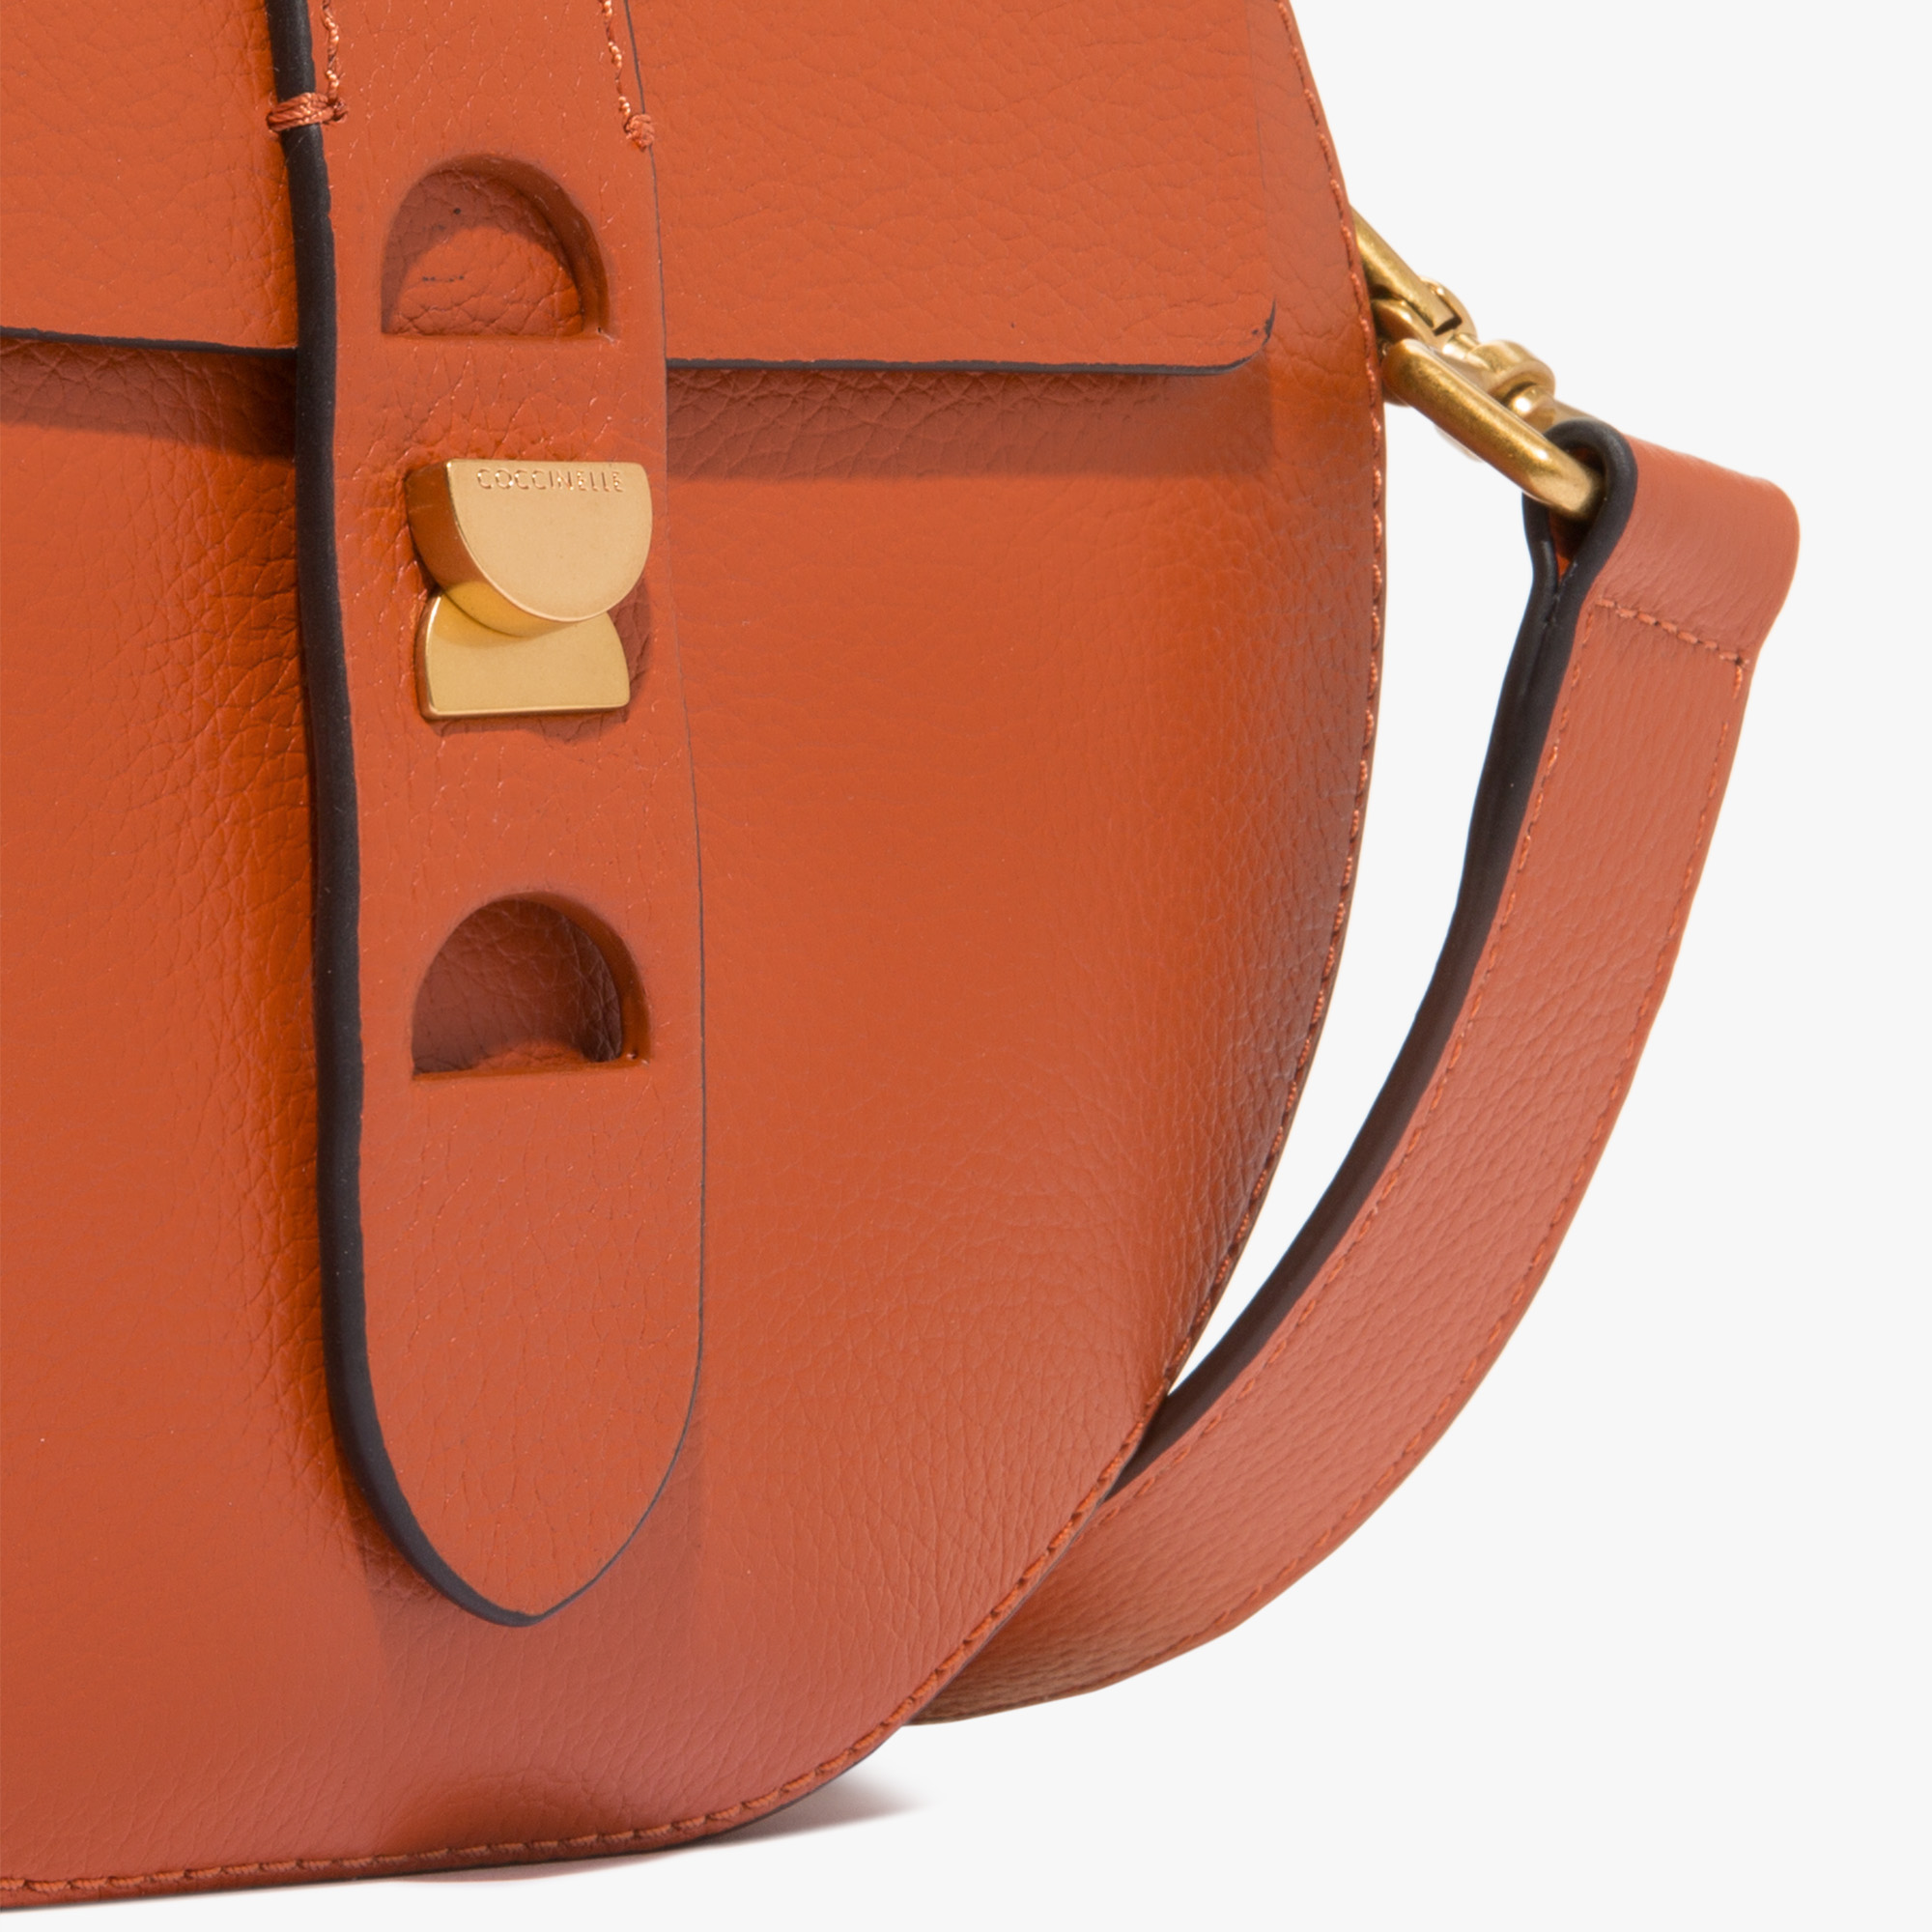 Carousel leather mini bag